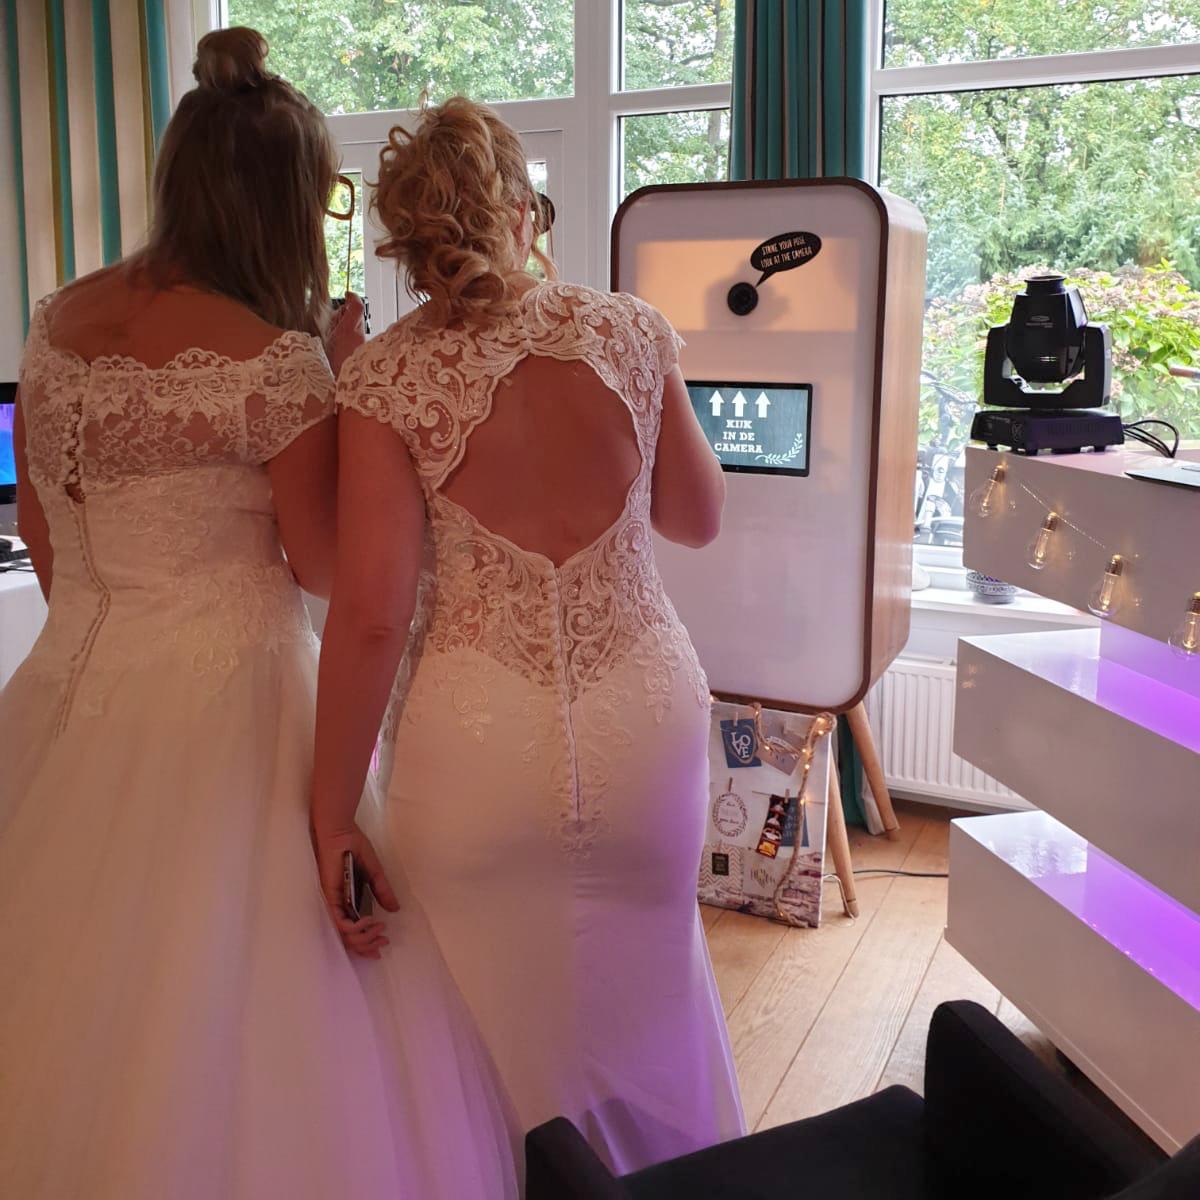 Flitskist op een bruiloft